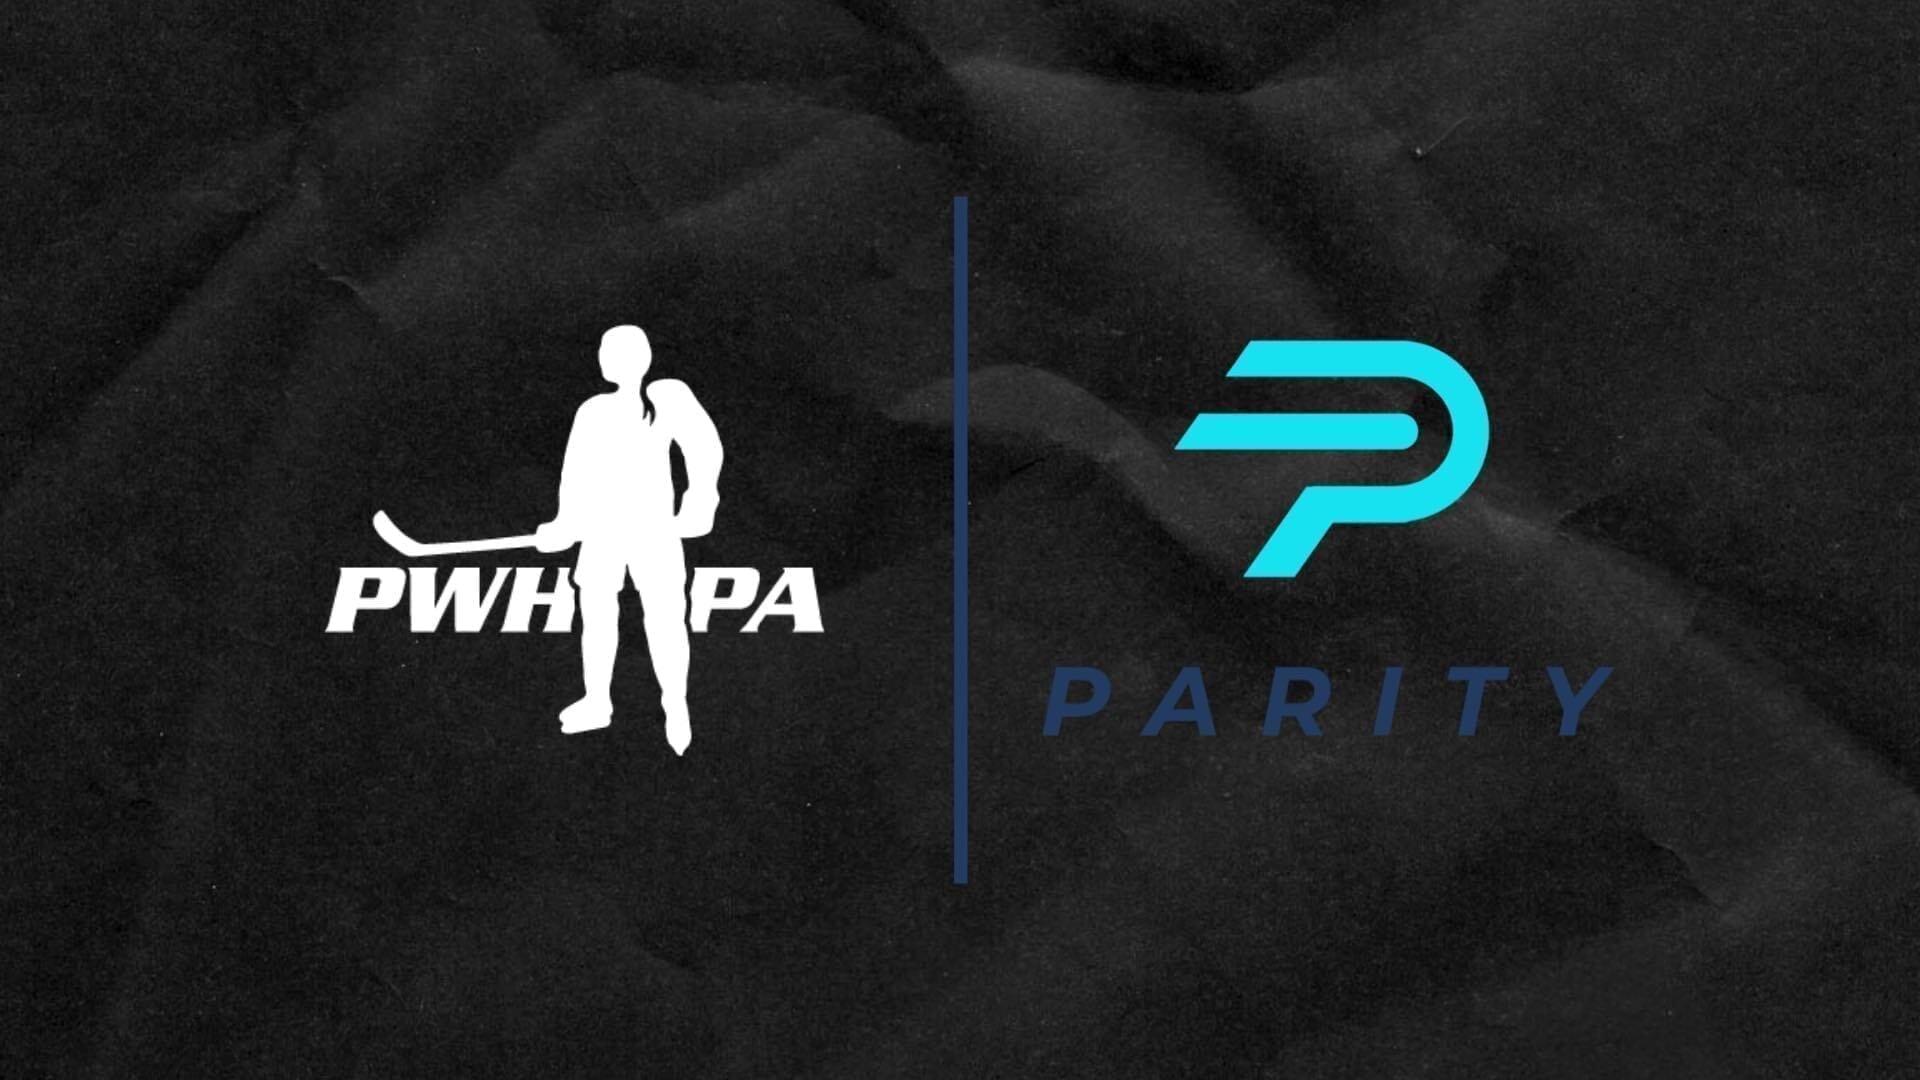 PWHPA Parity